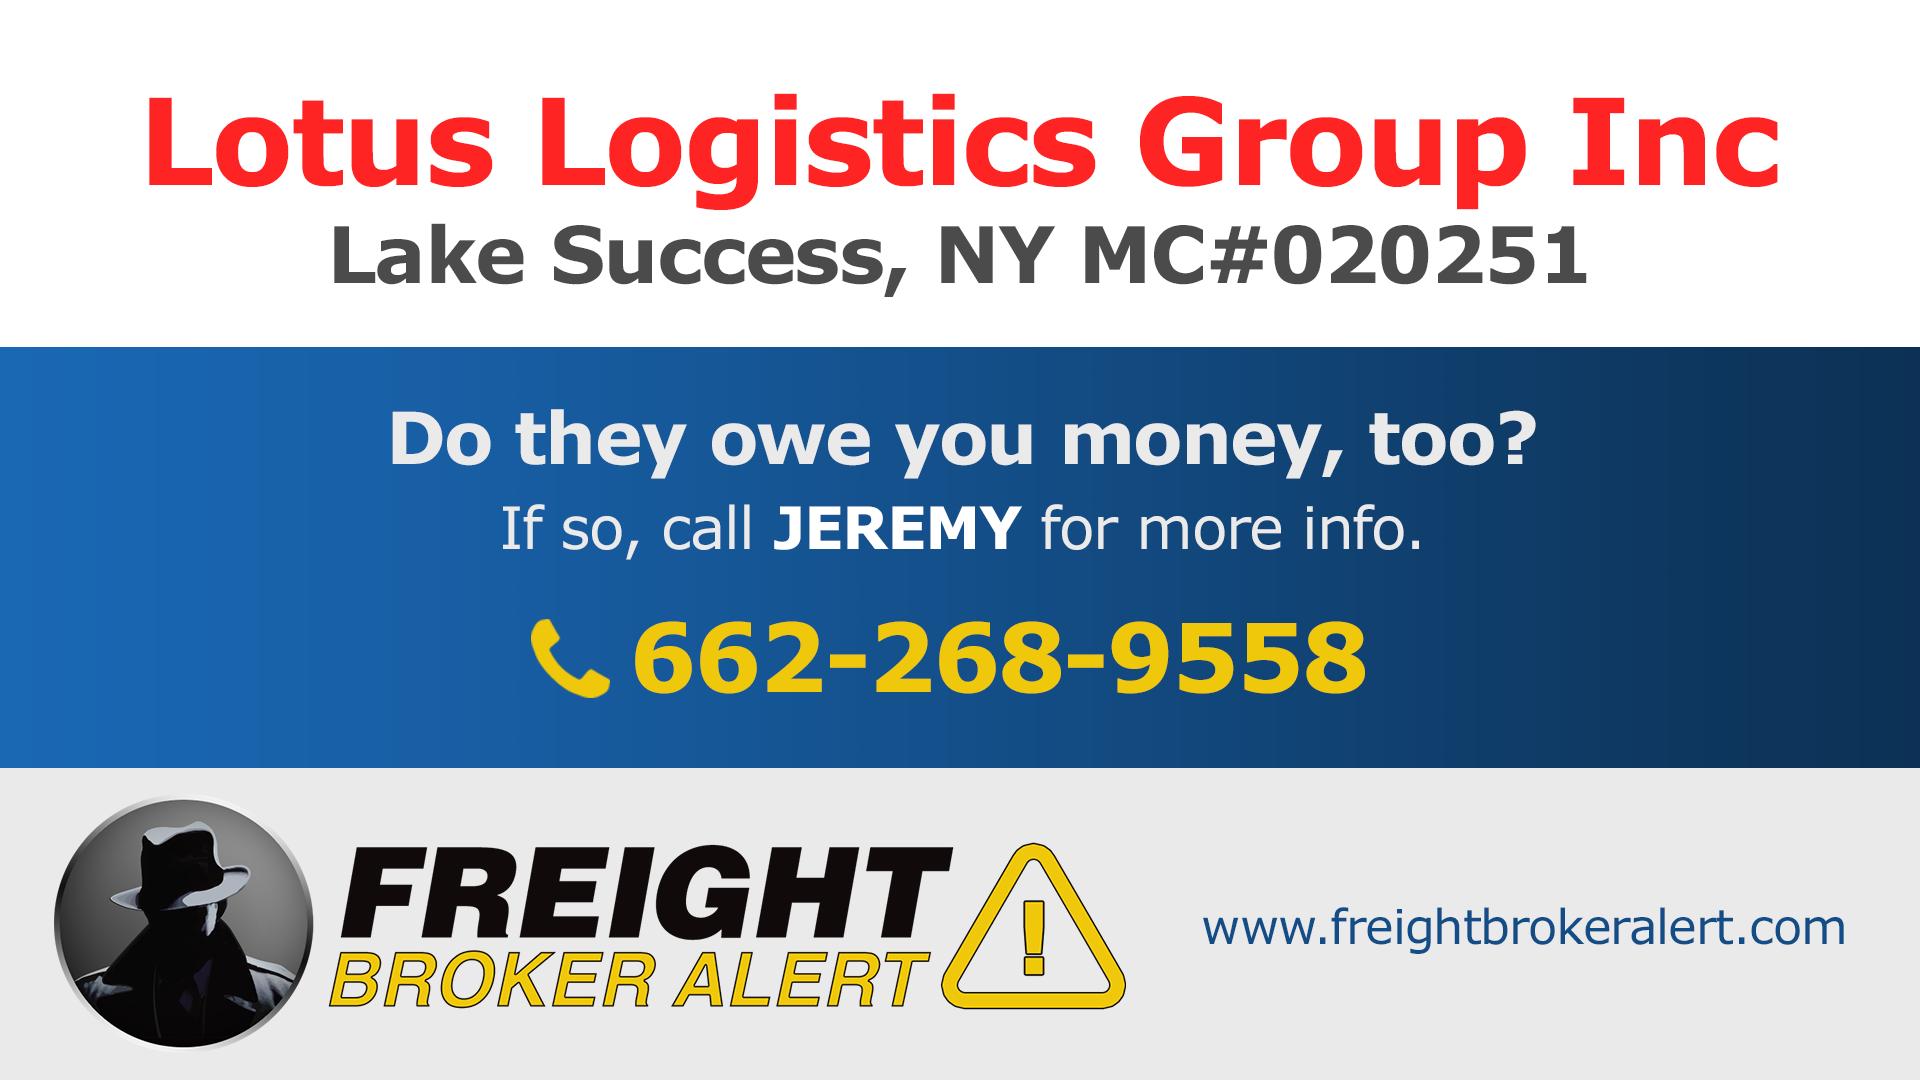 Lotus Logistics Group Inc New York